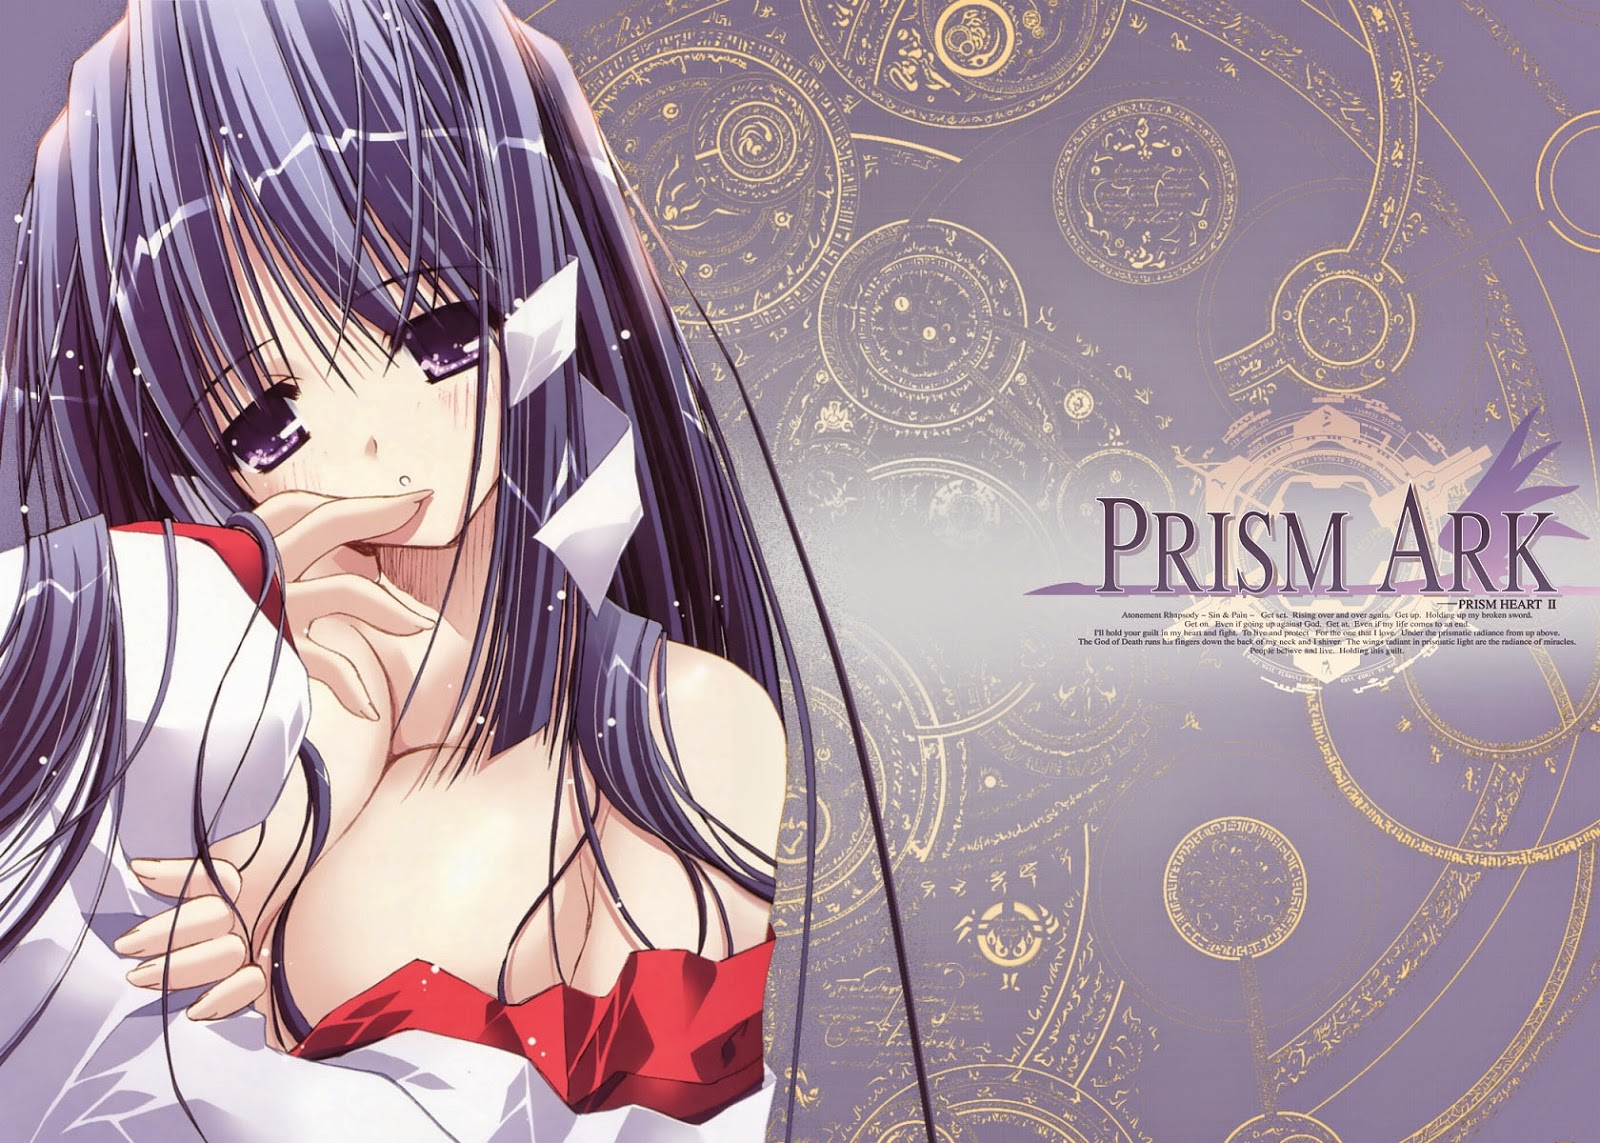 Download Prism Ark Subtitle Indonesia (Complete)